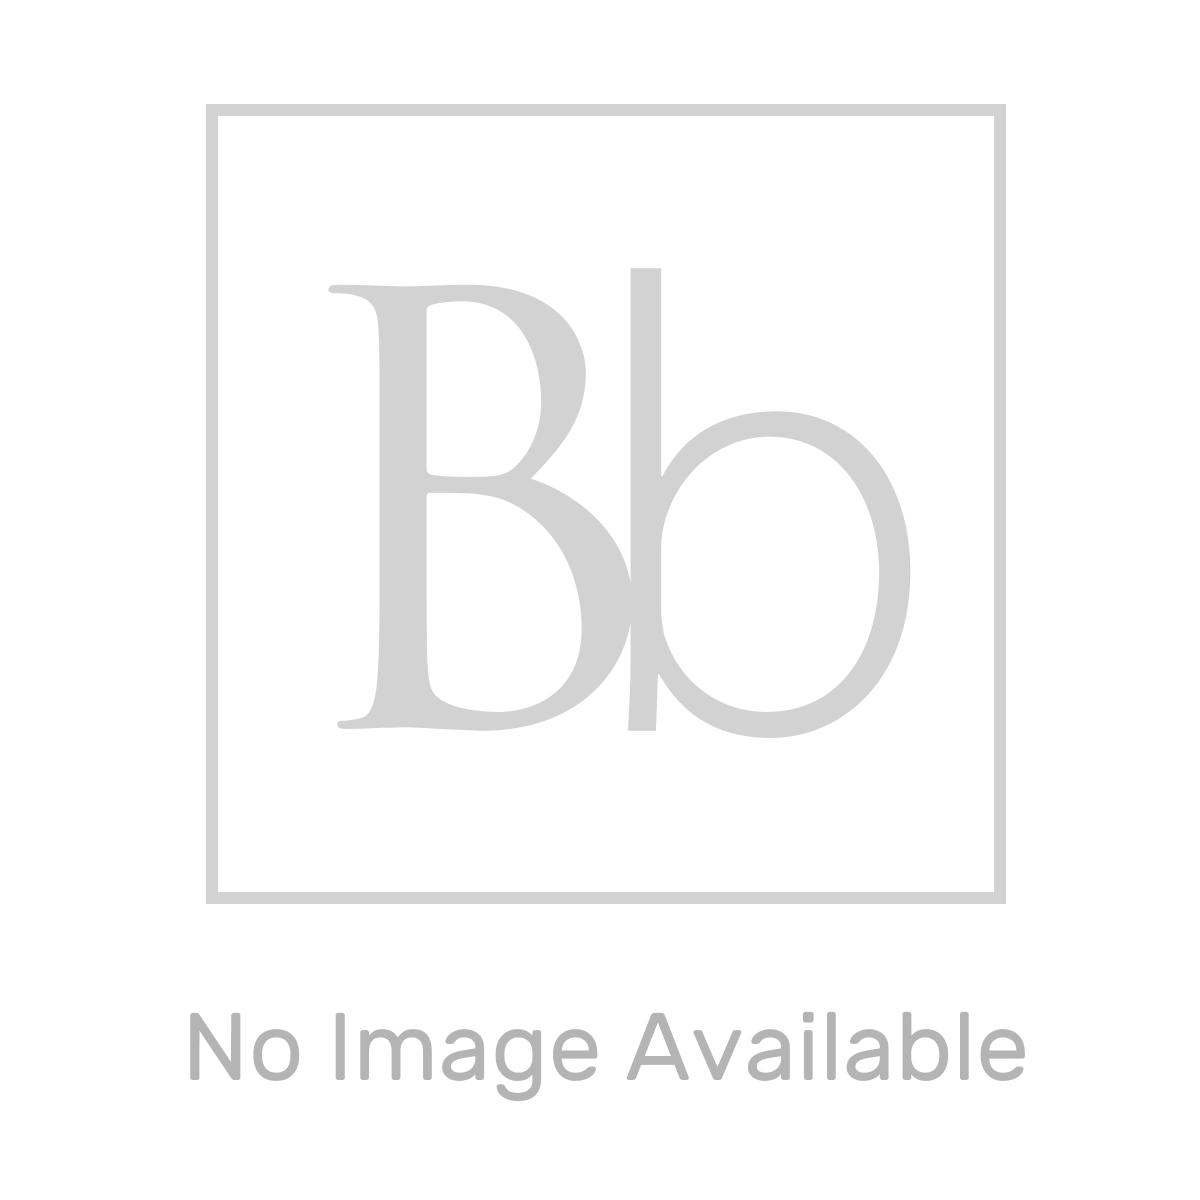 Ikoma White Gloss Vanity Unit with Basin 550mm Basin